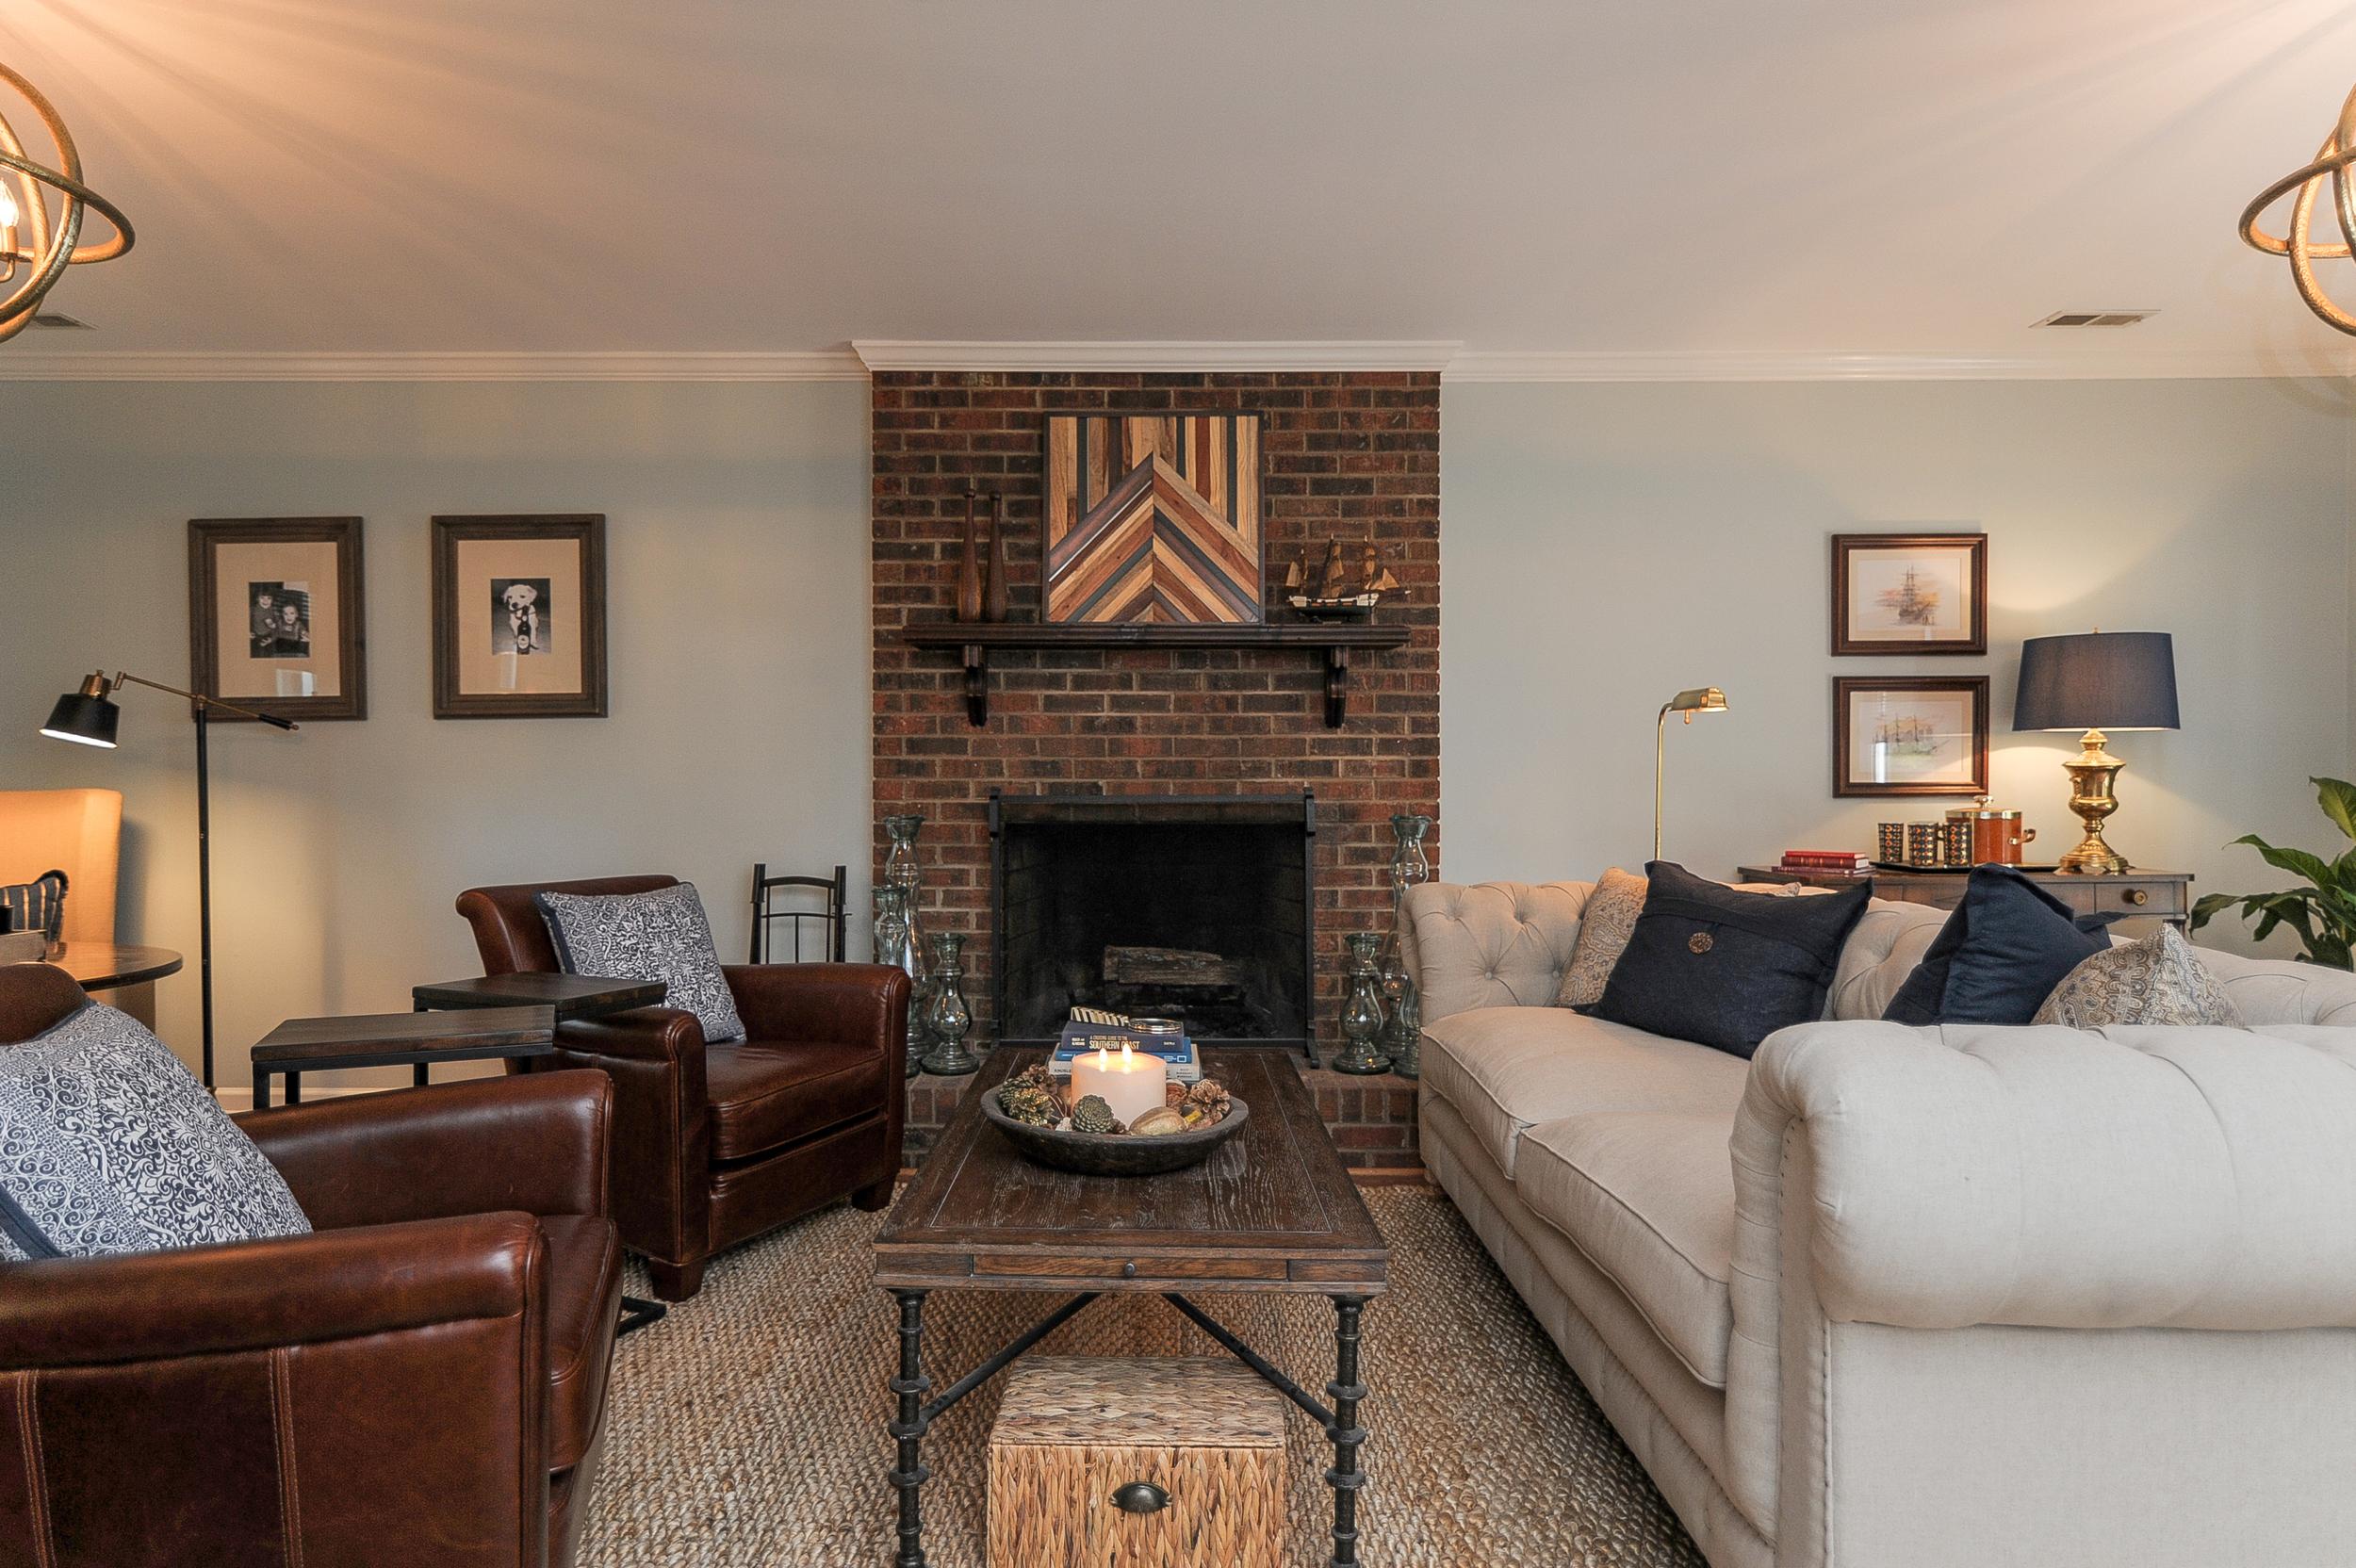 Artful Interiors - Bachelor Pad - Living Room